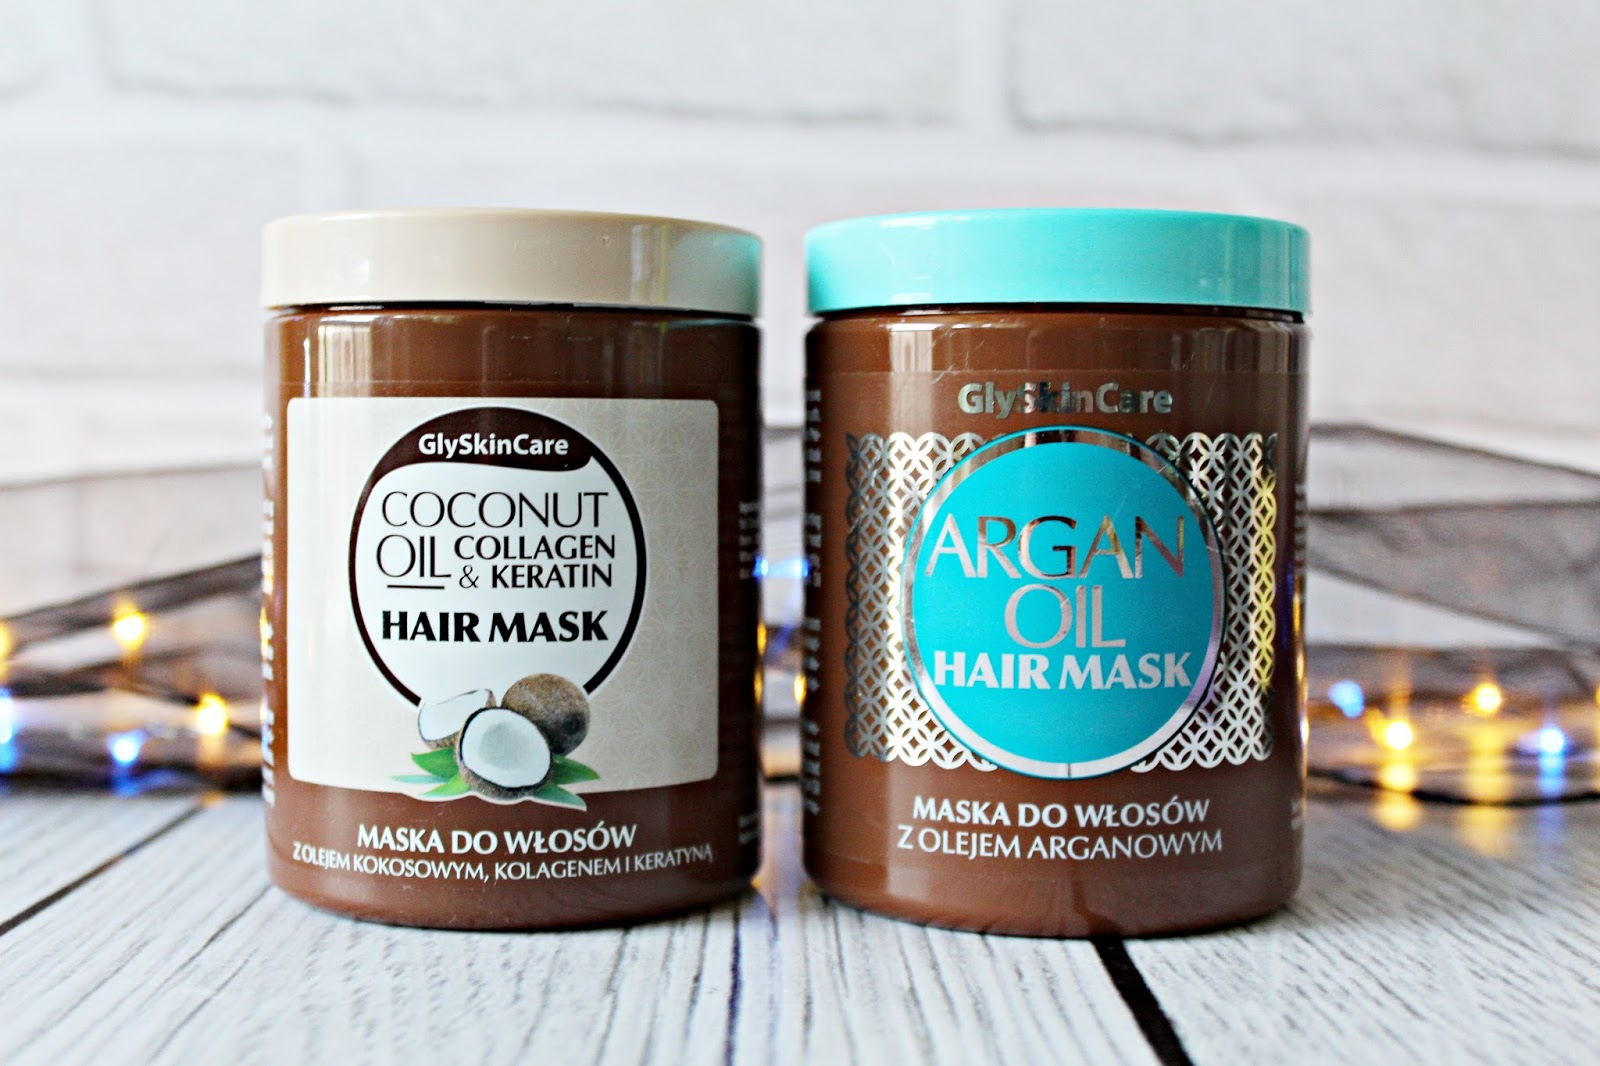 COCONUT OIL COLLAGEN & KERATIN HAIR MASK / ARGAN OIL HAIR MASK - GlySkinCare